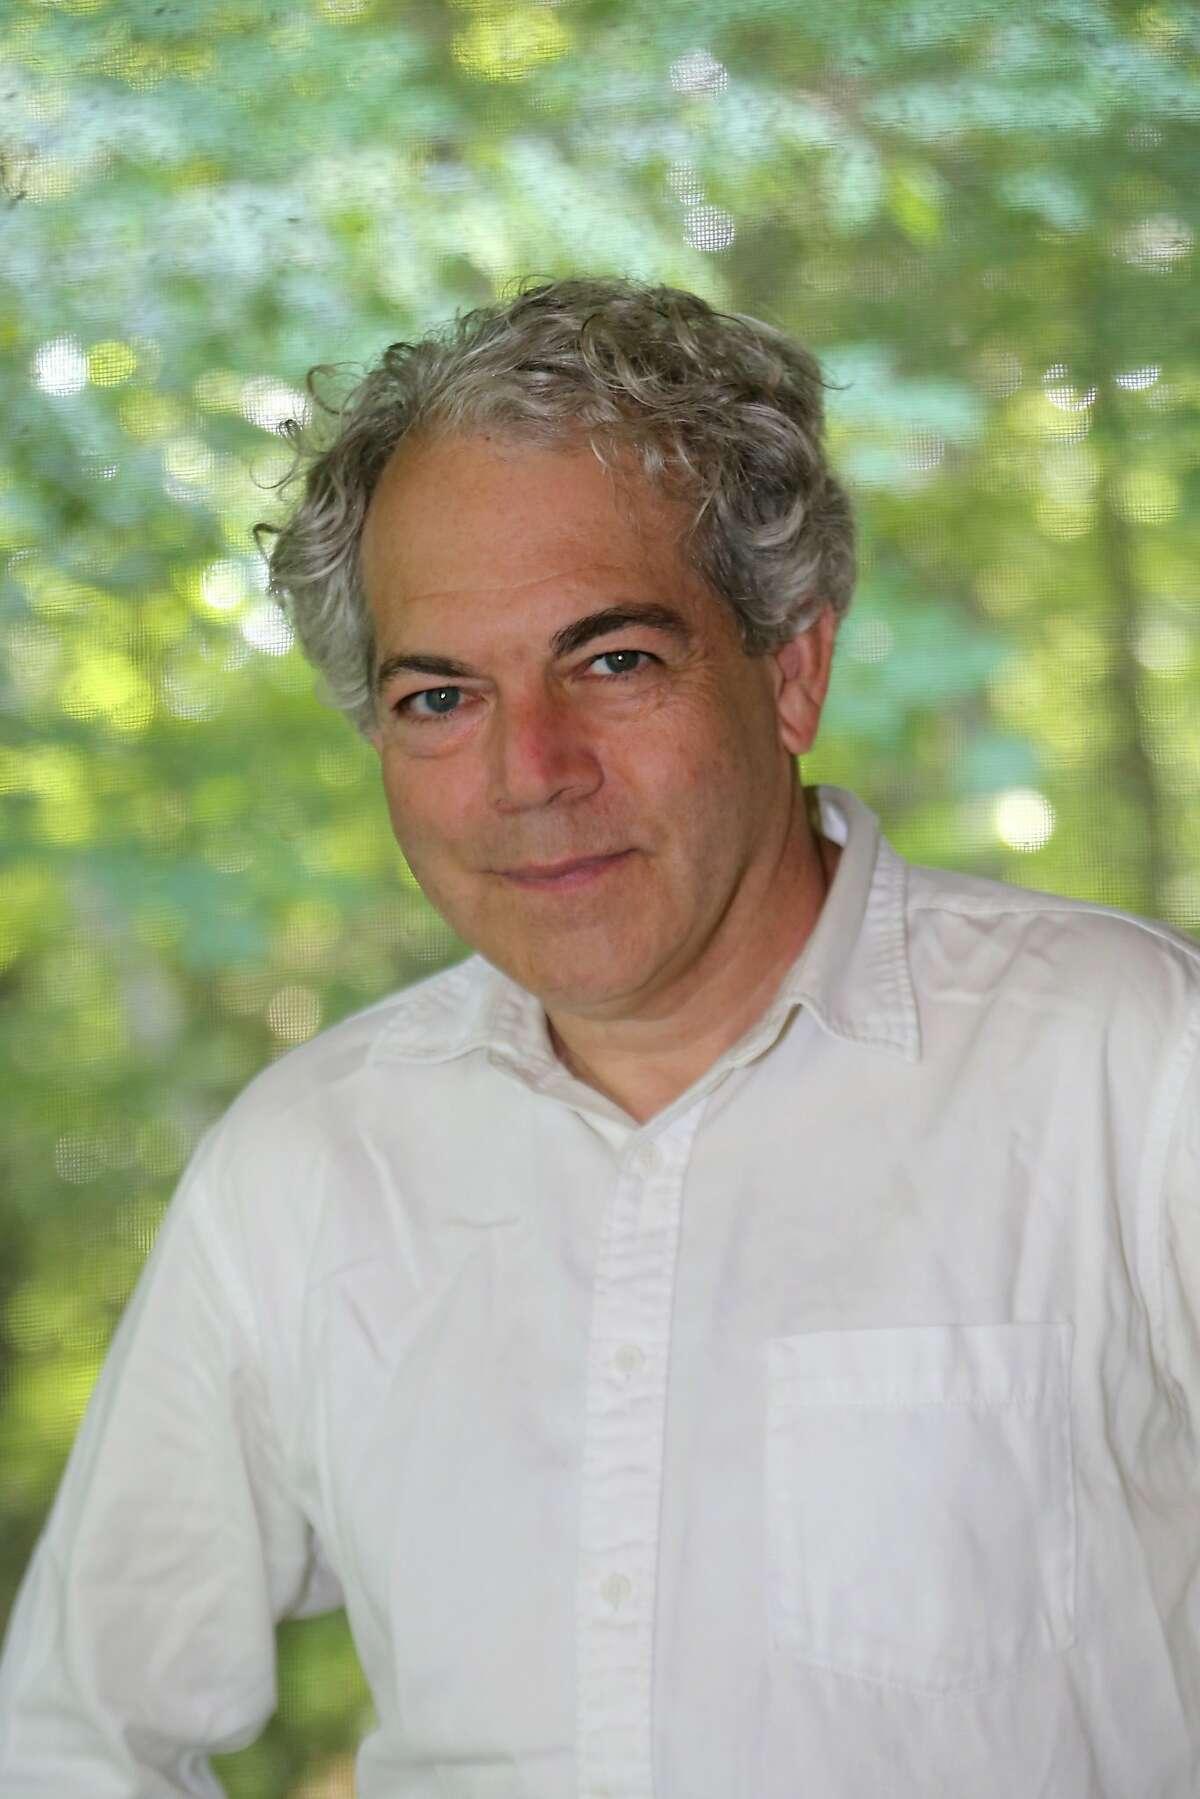 Michael Almereyda, director of